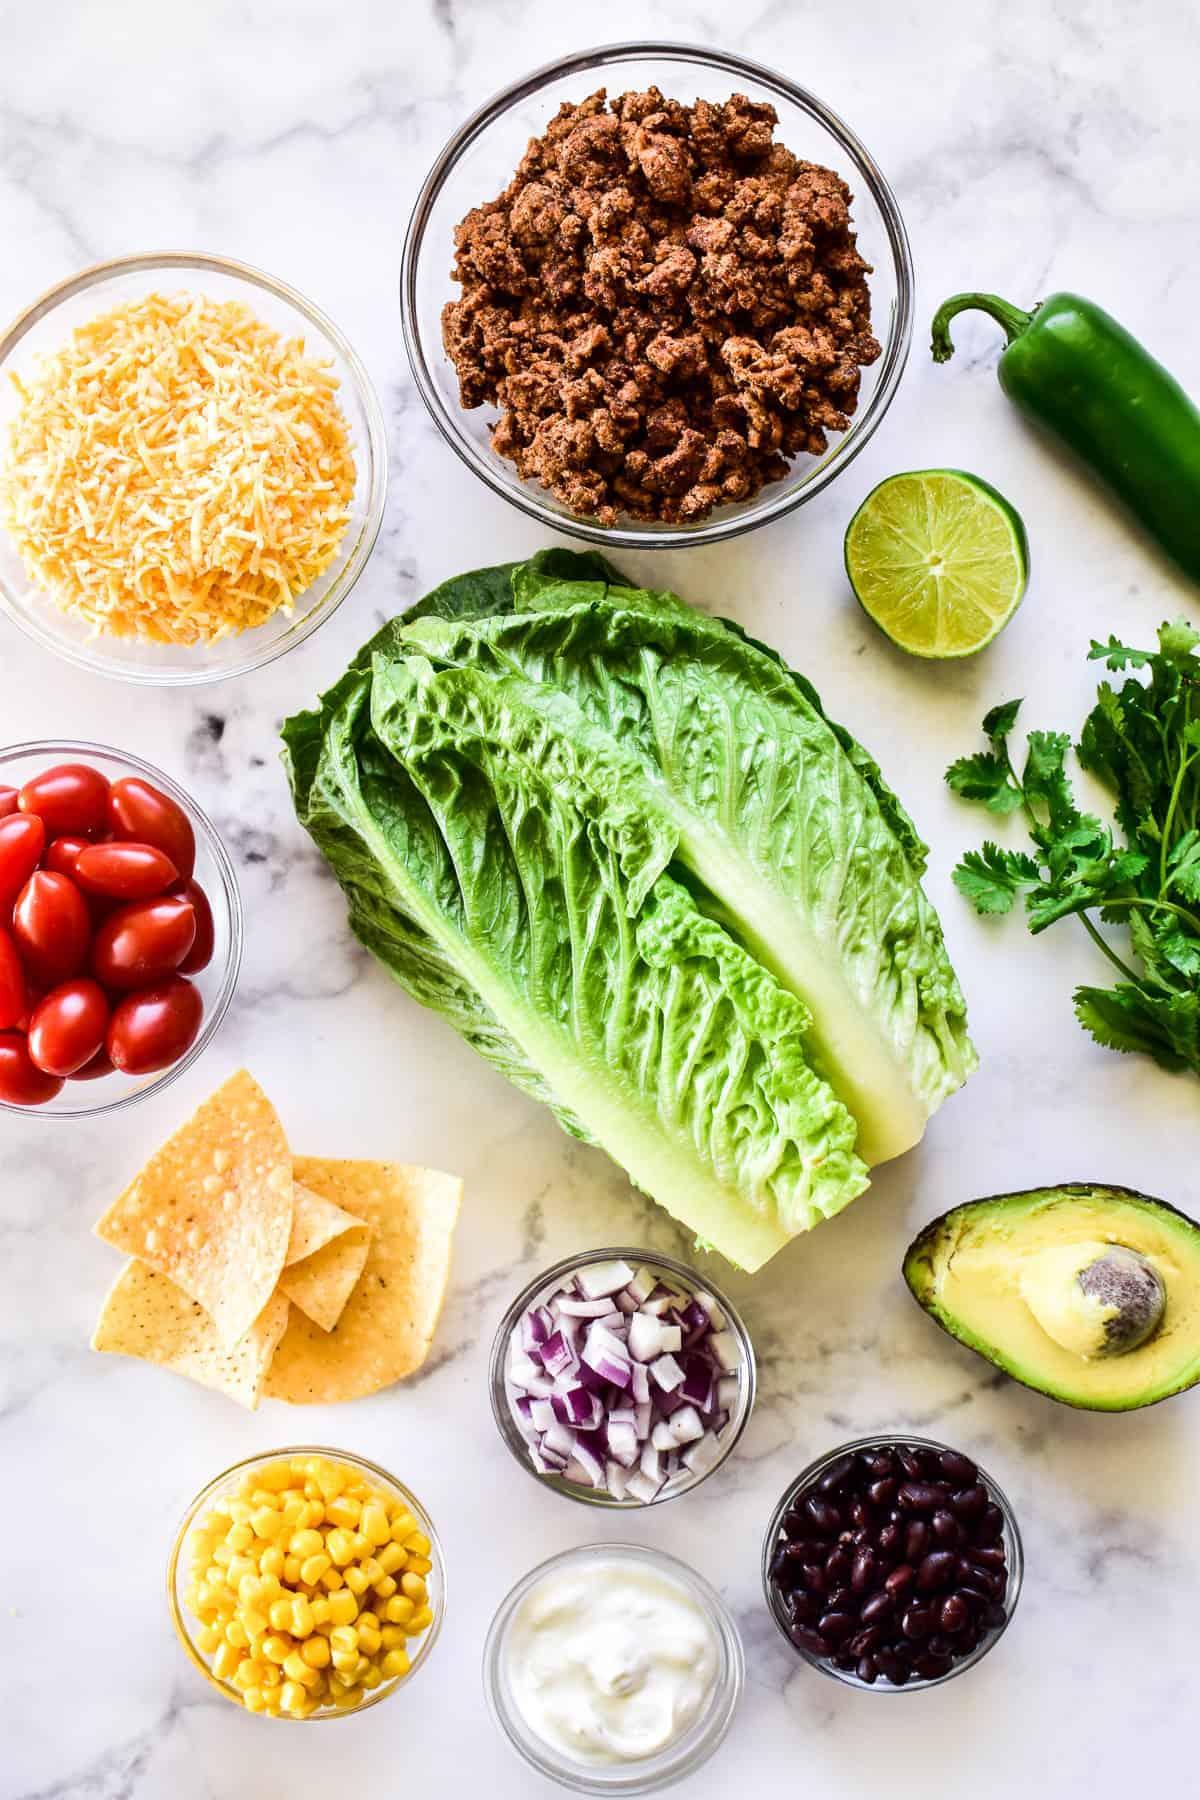 Taco Salad ingredients